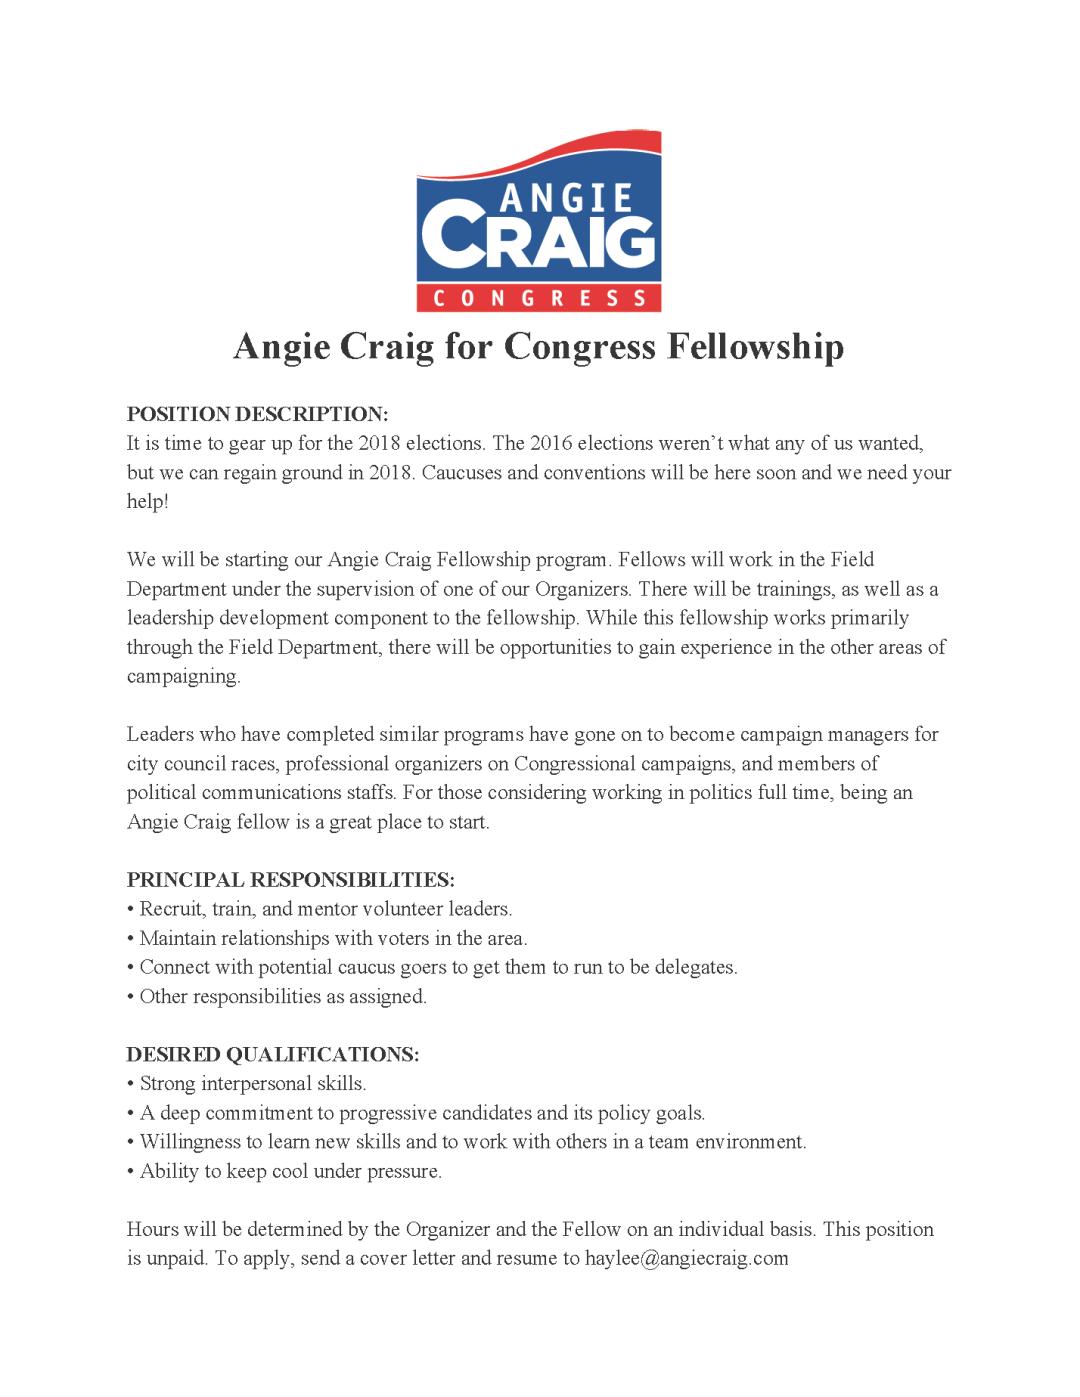 Angie Craig Fellowship.png